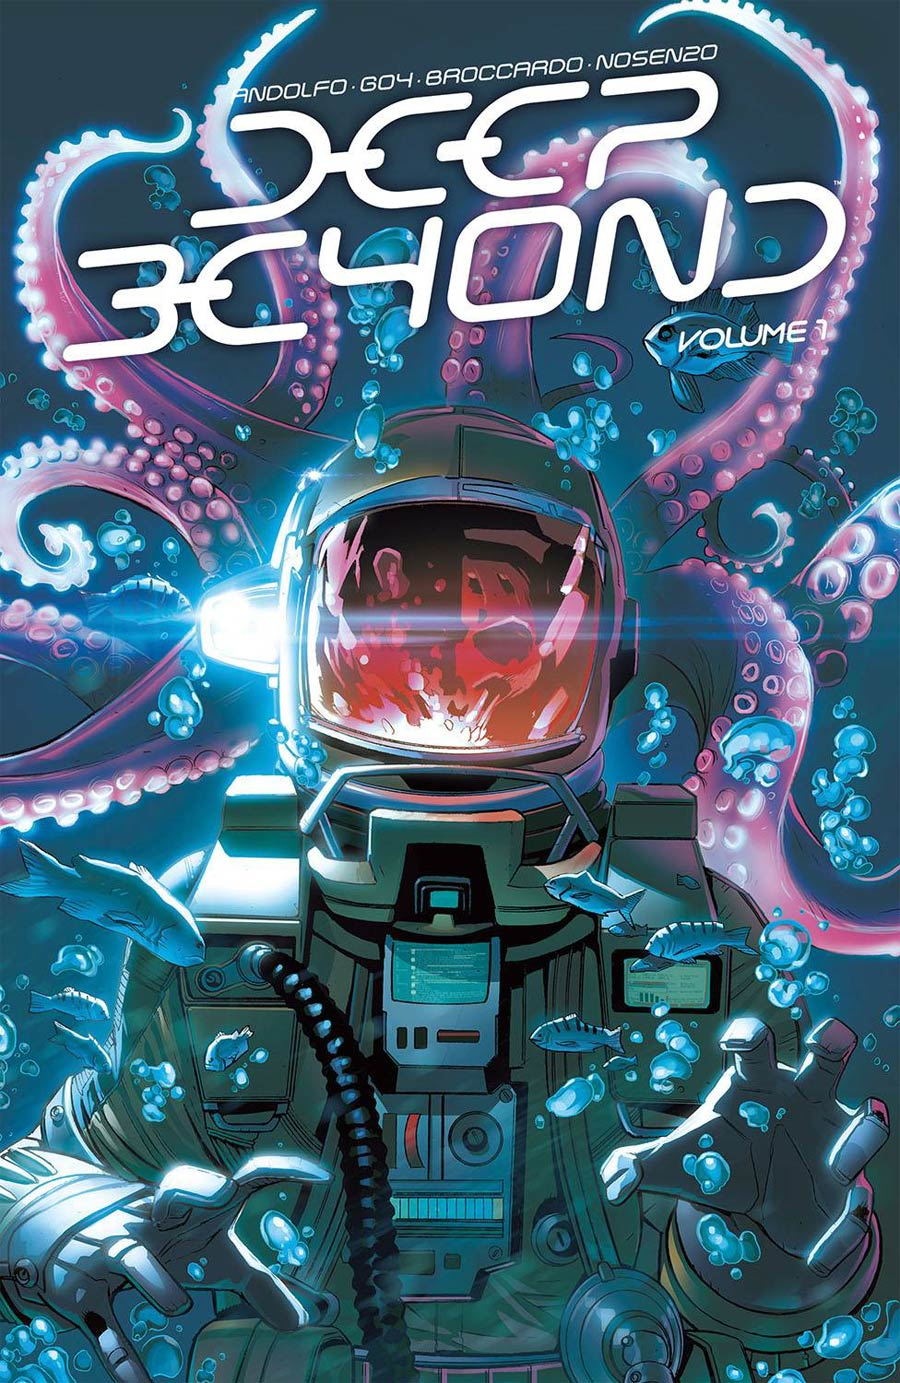 Deep Beyond Vol 1 TP